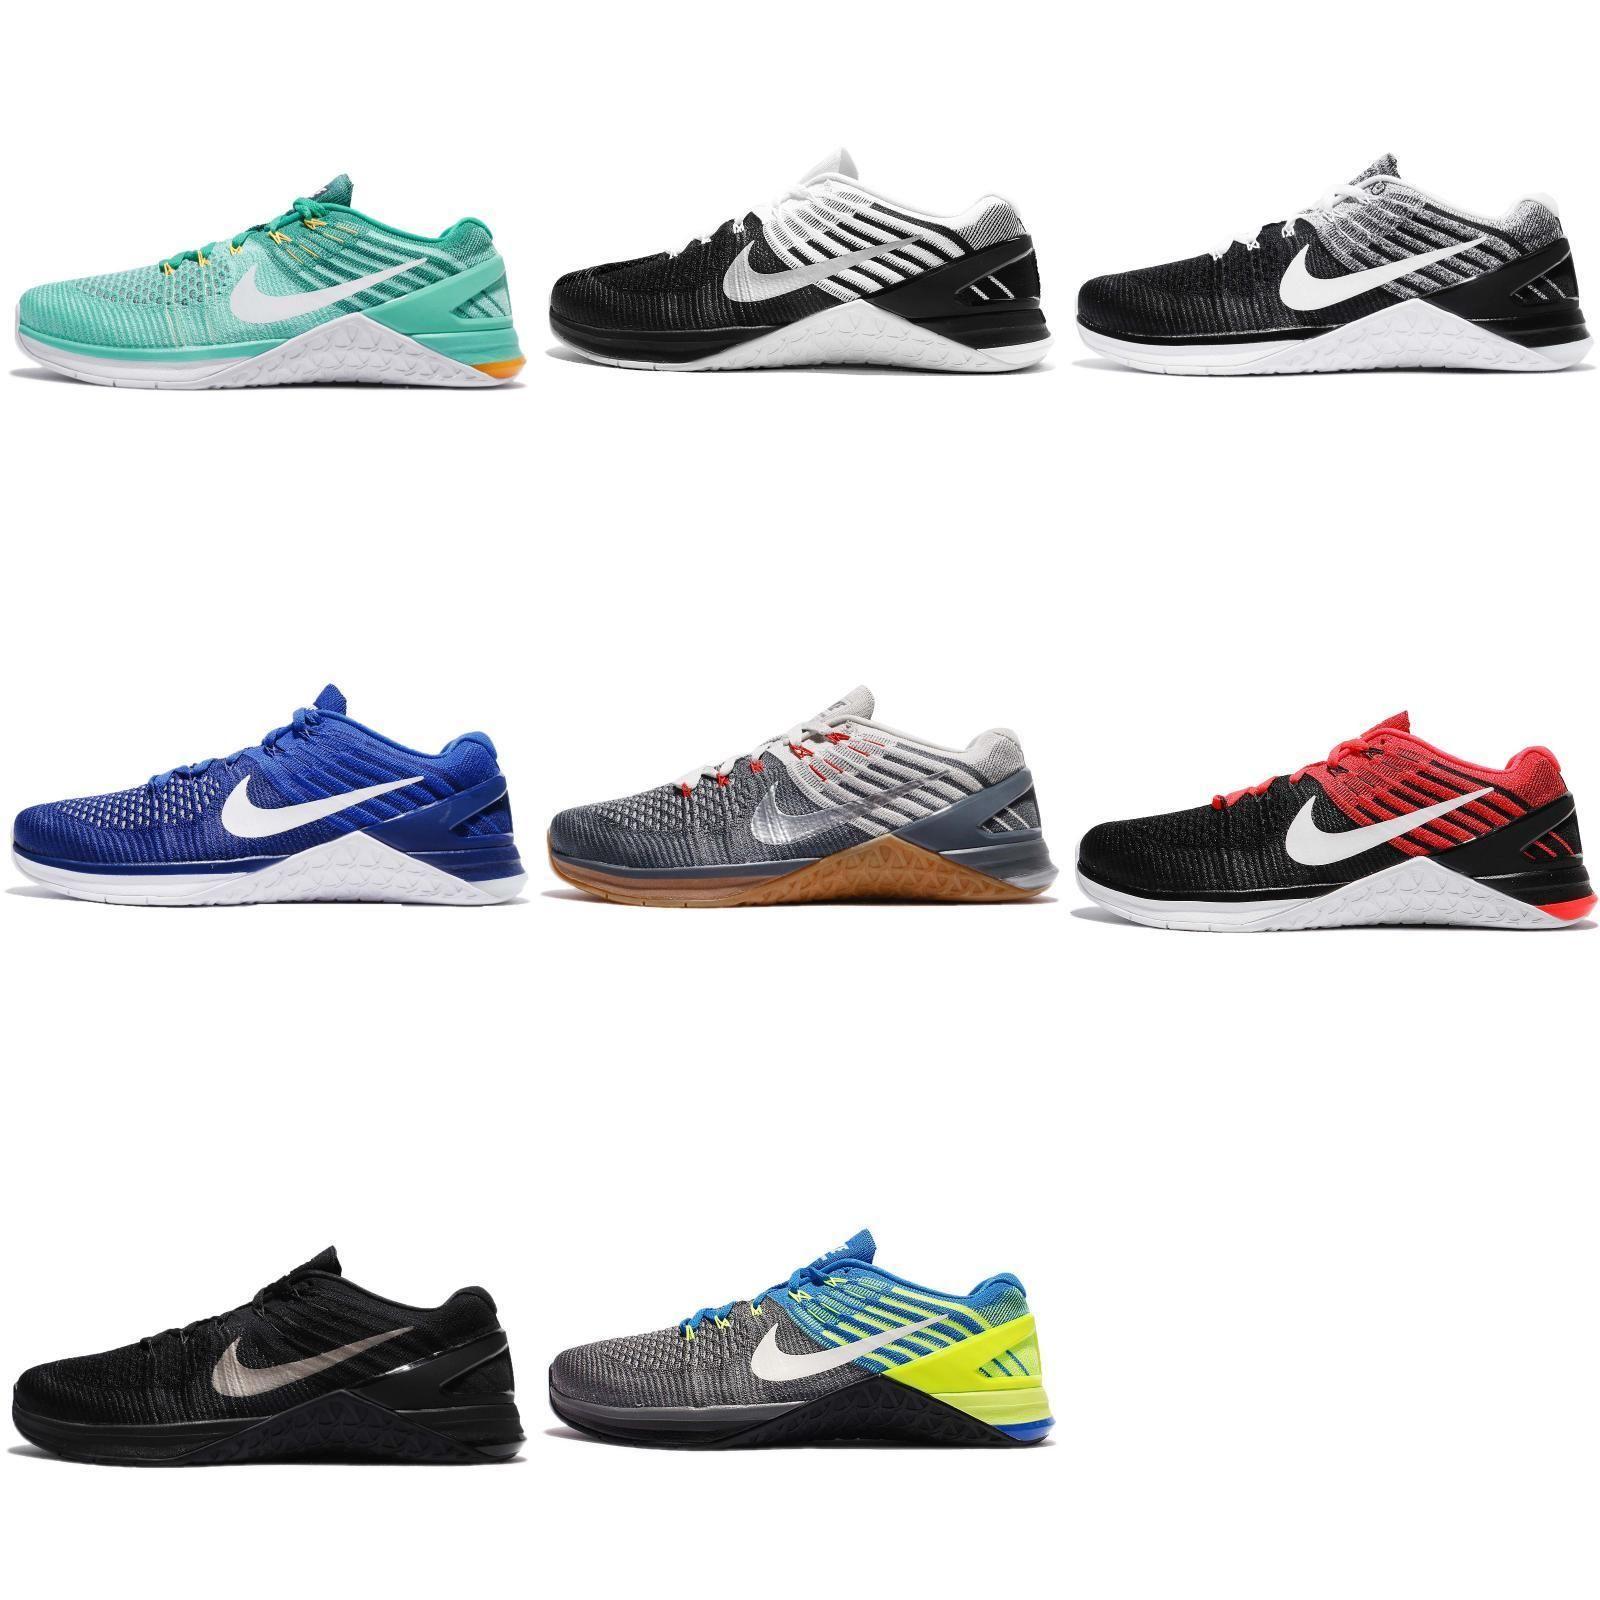 e4352de10166 Nike Metcon DSX Flyknit Men Training Lifting Shoes Trainers Pick 1 ...